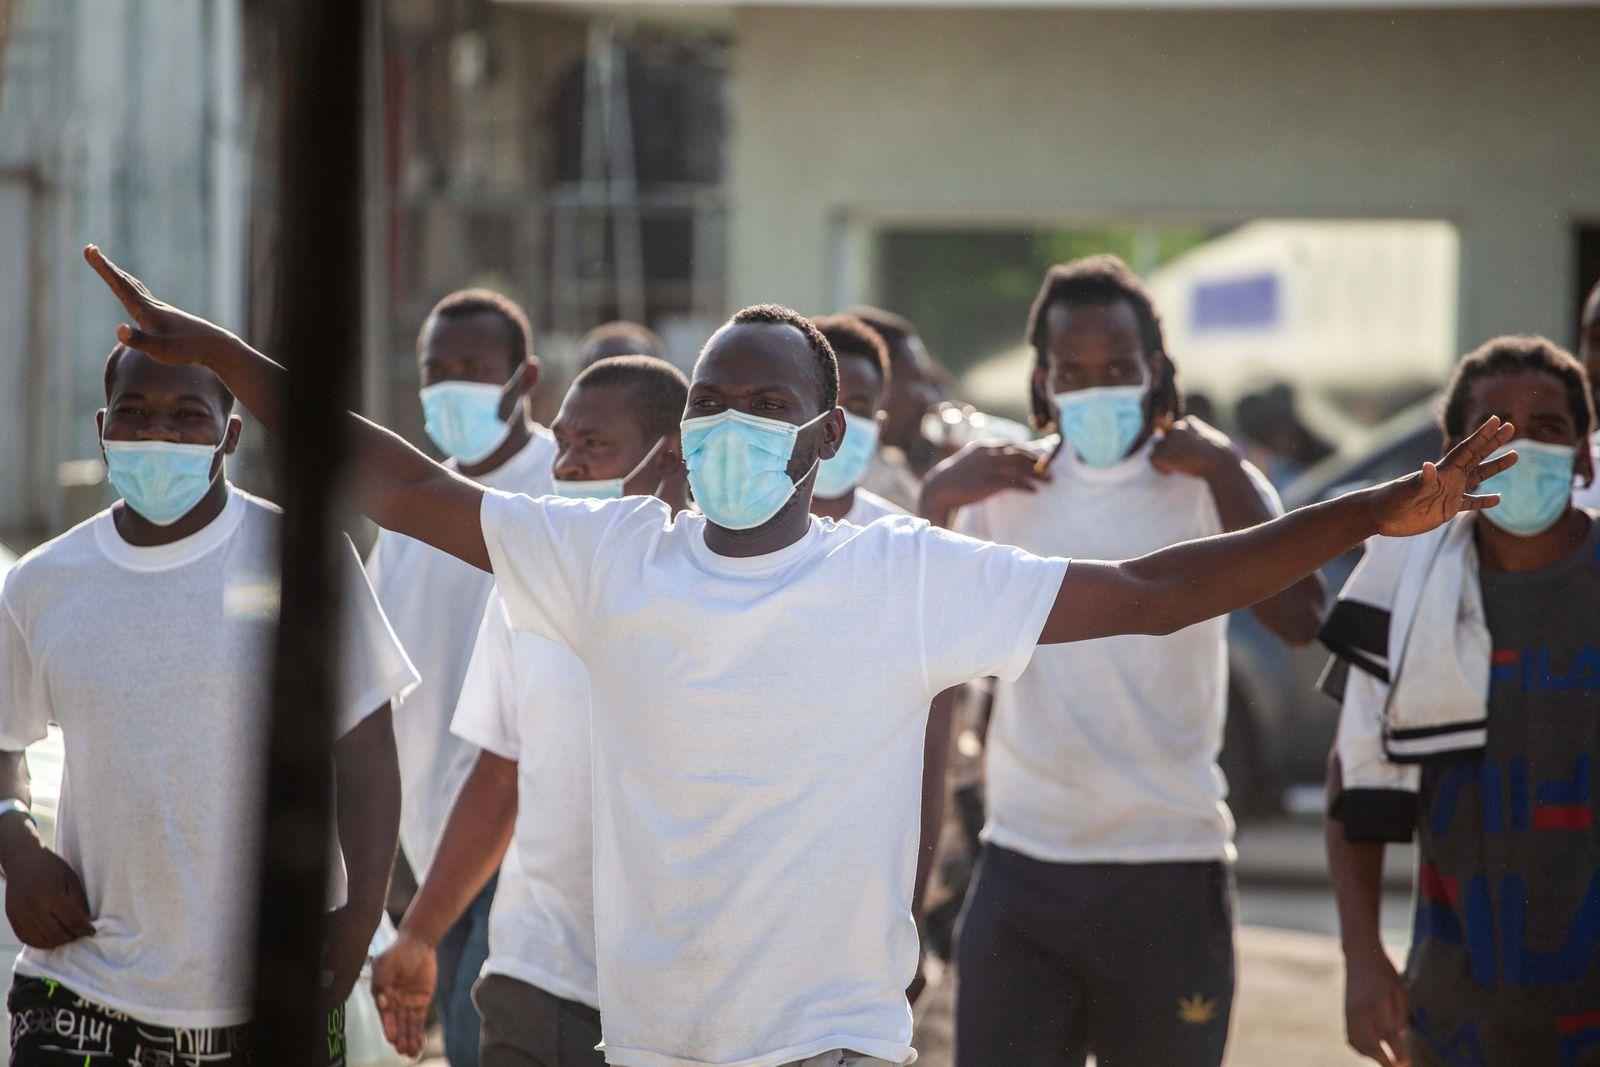 UN: US violates international standards with expulsion of Haitians